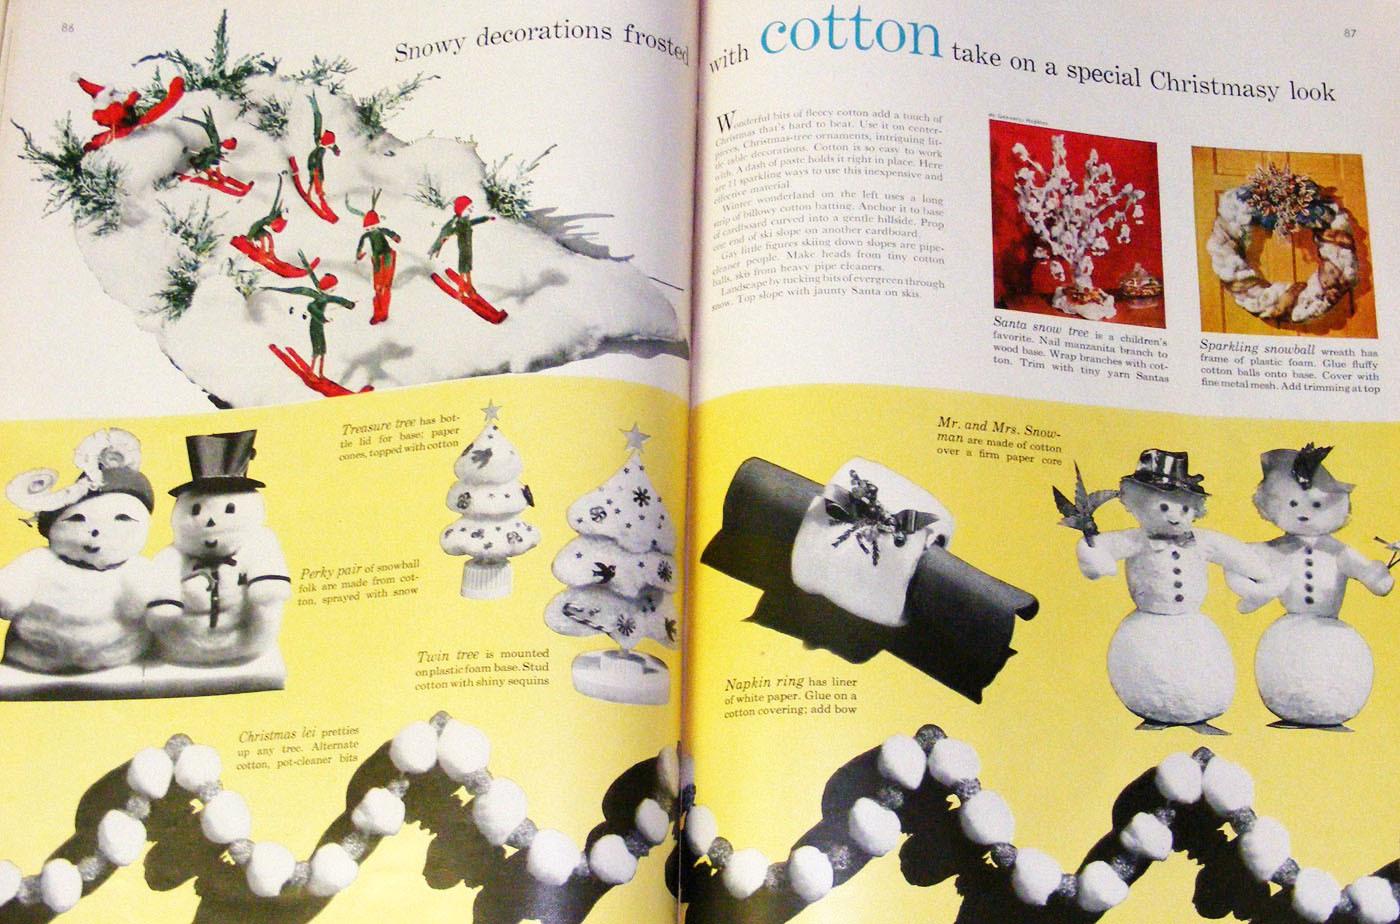 1955 CHRISTMAS IDEAS Magazine from Better Homes & Gardens